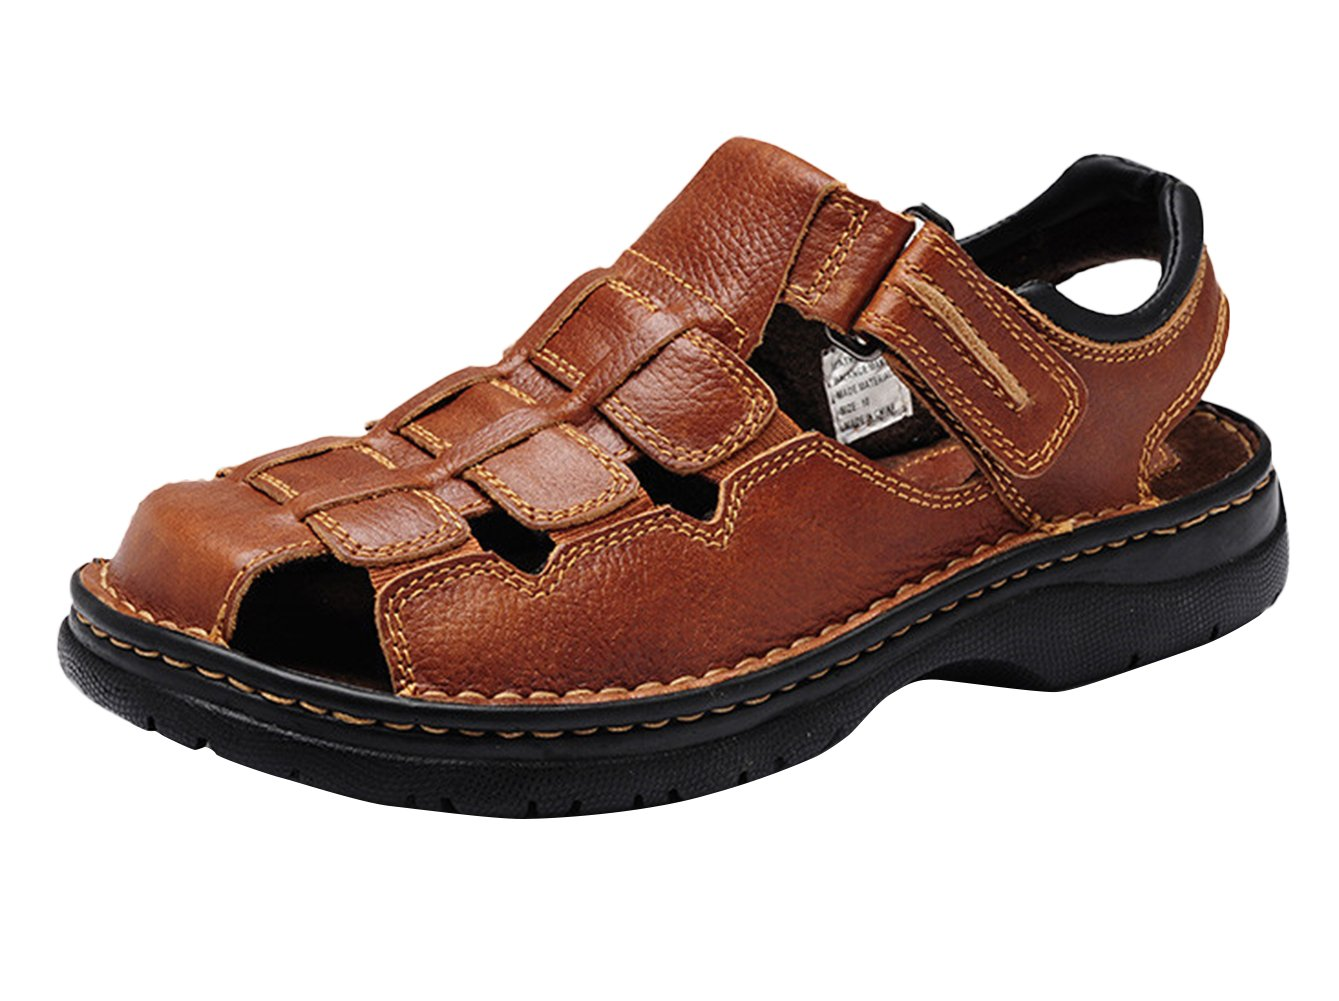 Insun Sandalias De Cuero Para Hombre Zapatos Al Aire Libre 44 EU|Marrón